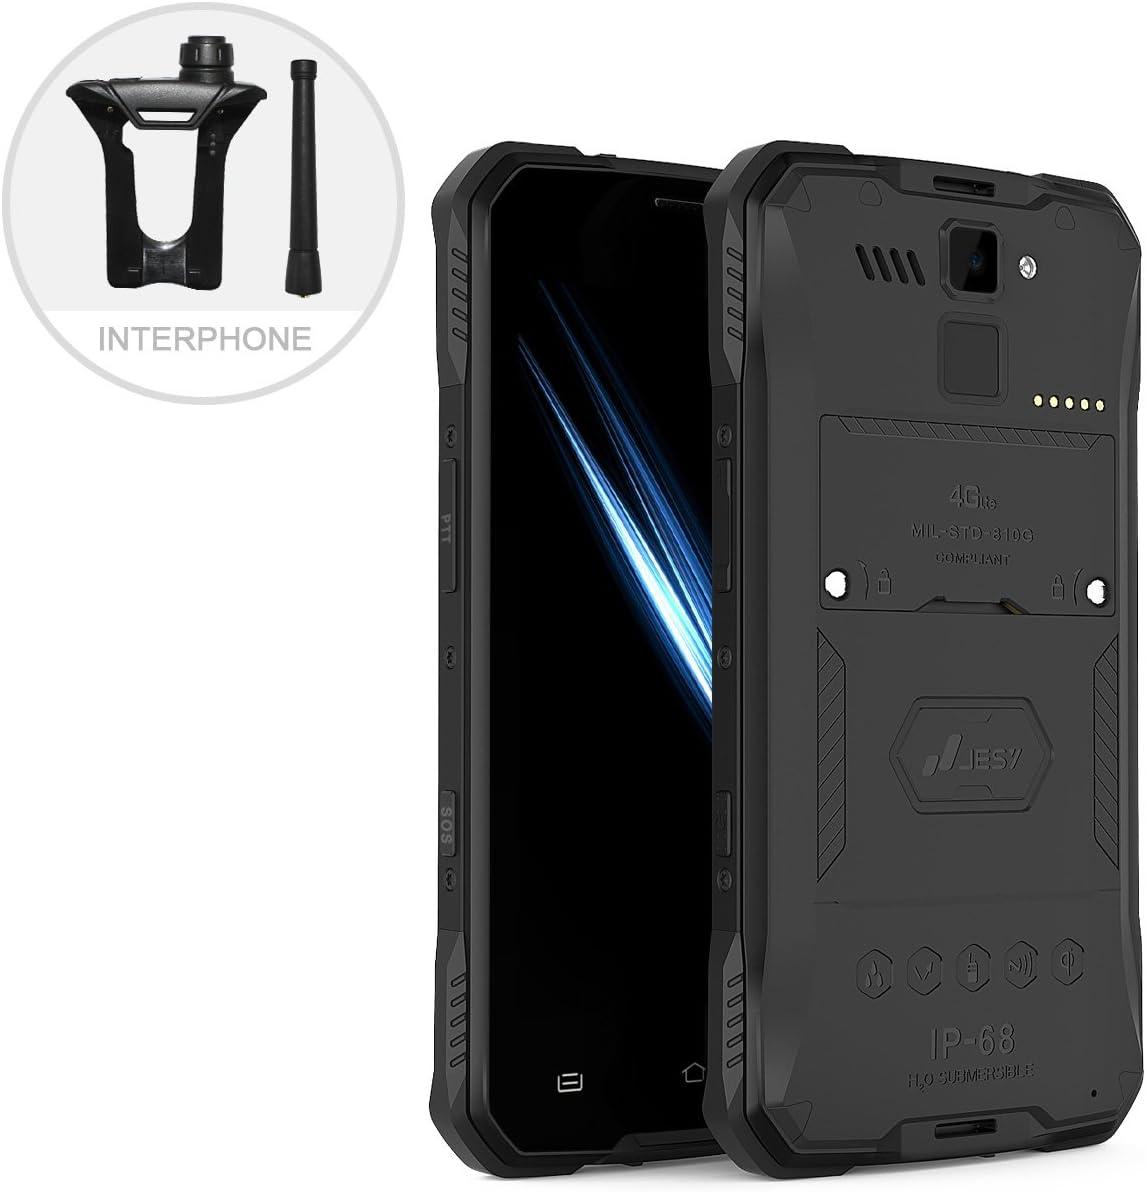 Jesy J7 4G LTE Teléfono Móvil Walkie-Talkie 4.7 Pulgadas Android ...